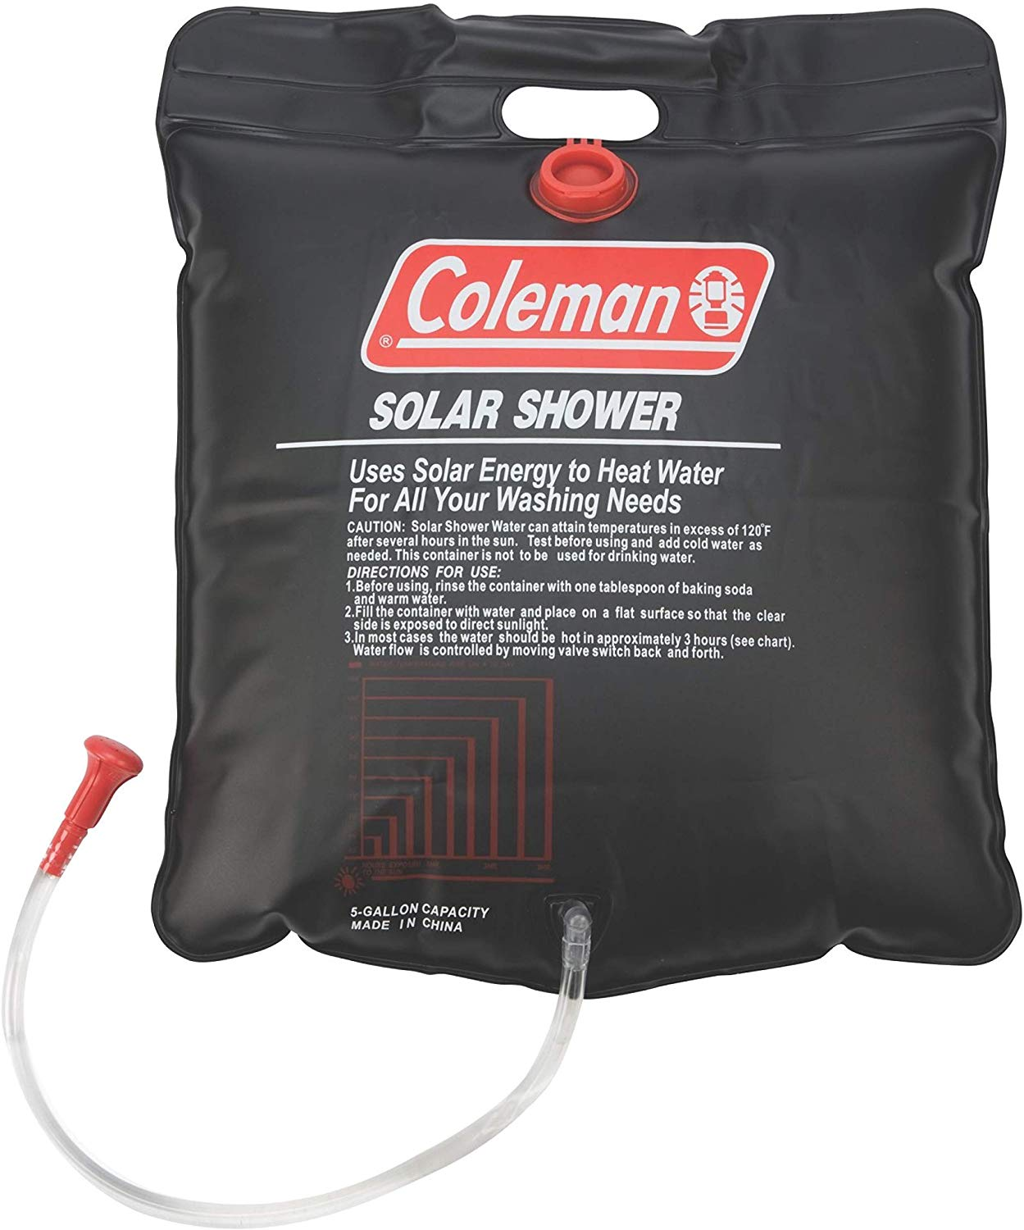 Coleman 5 gallon solar shower - photo 3